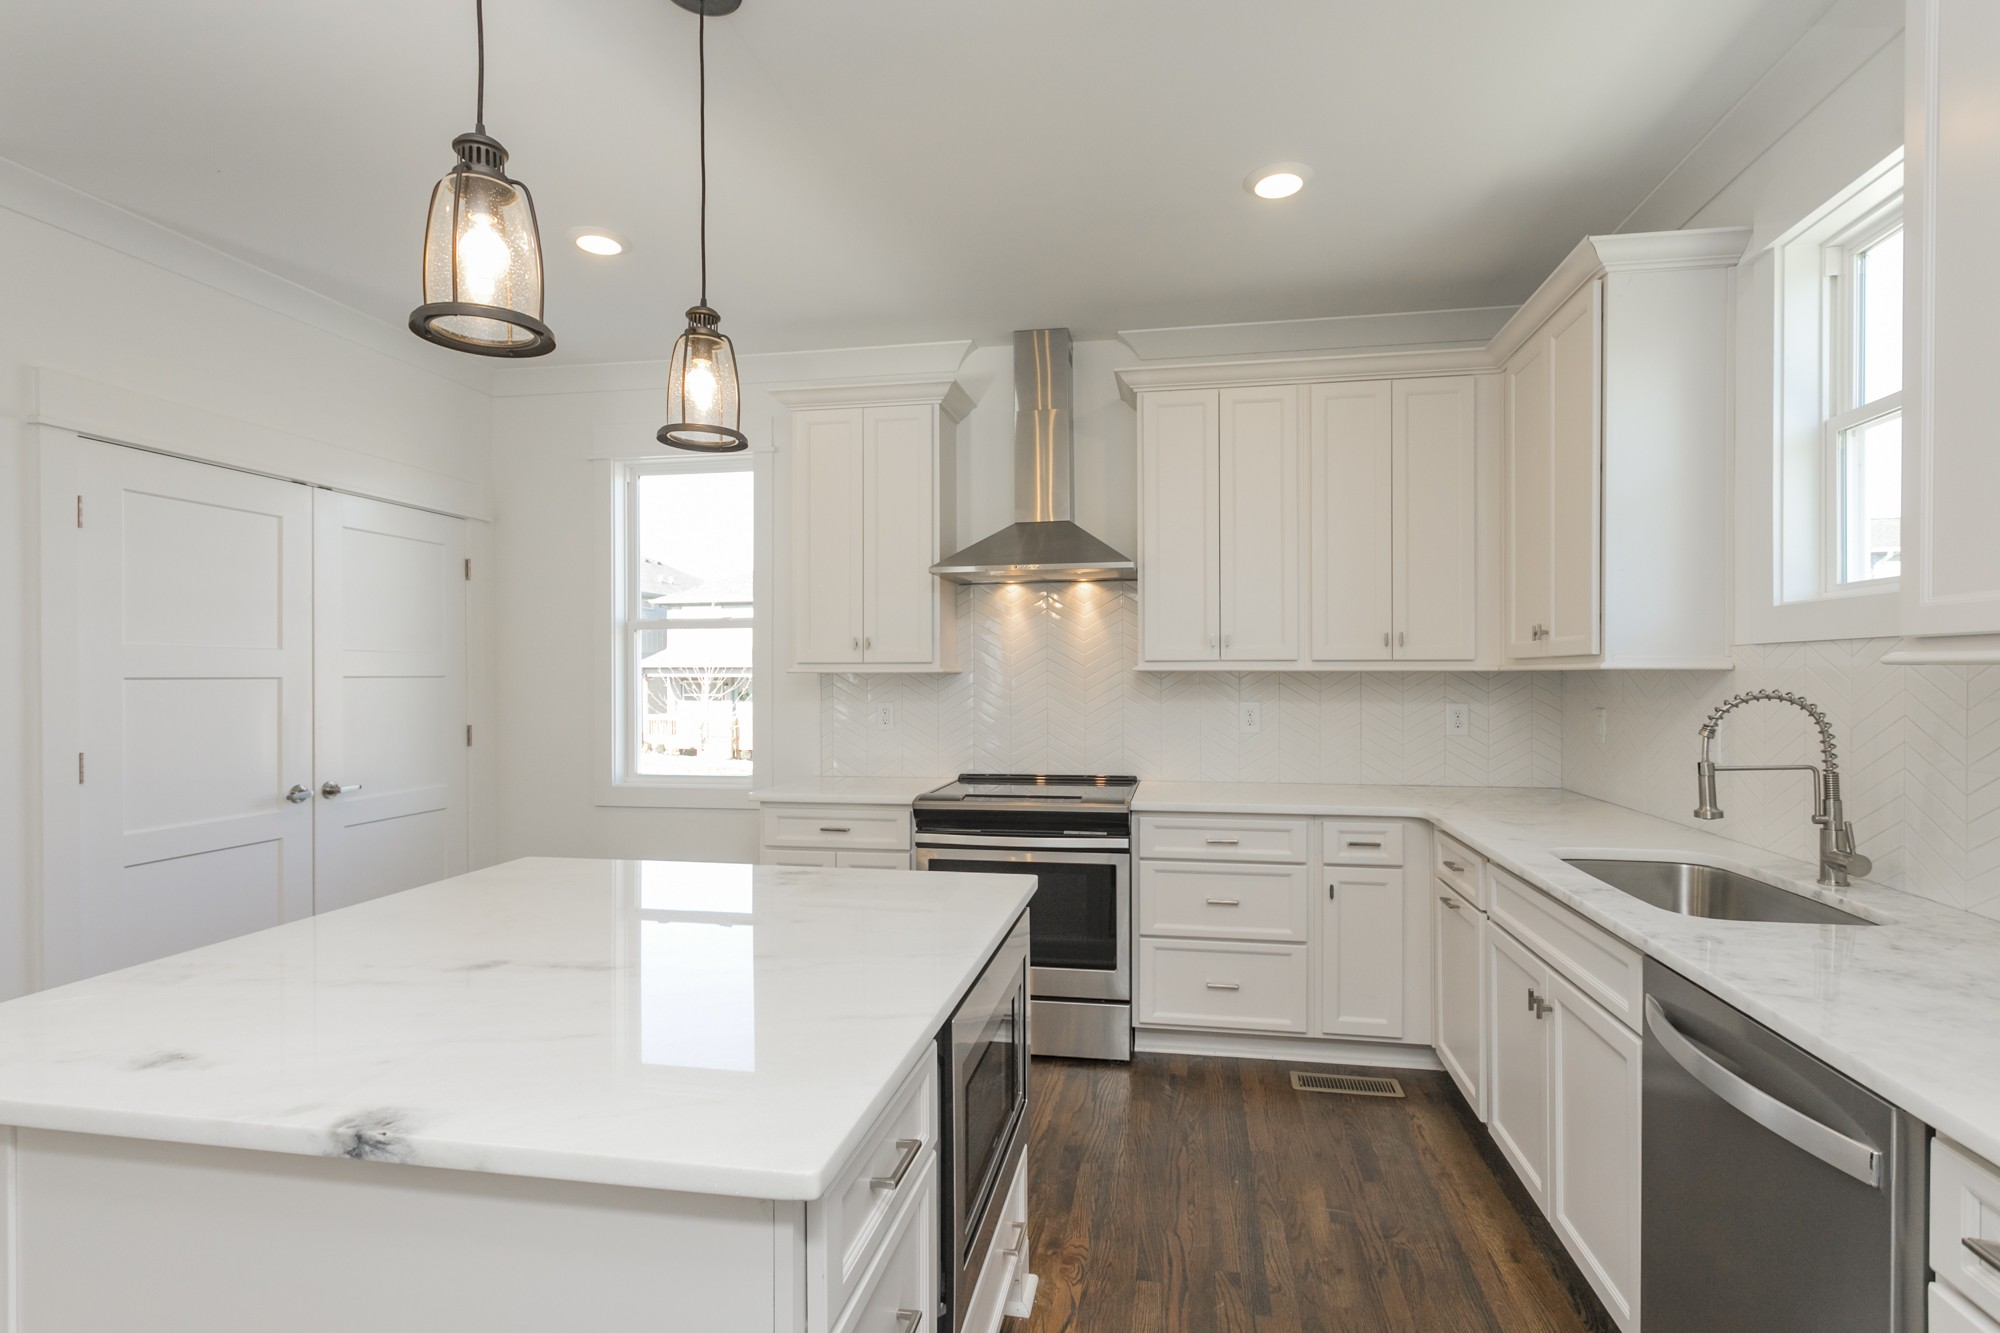 6374B Ivy St, Nashville, TN 37209 - Nashville, TN real estate listing